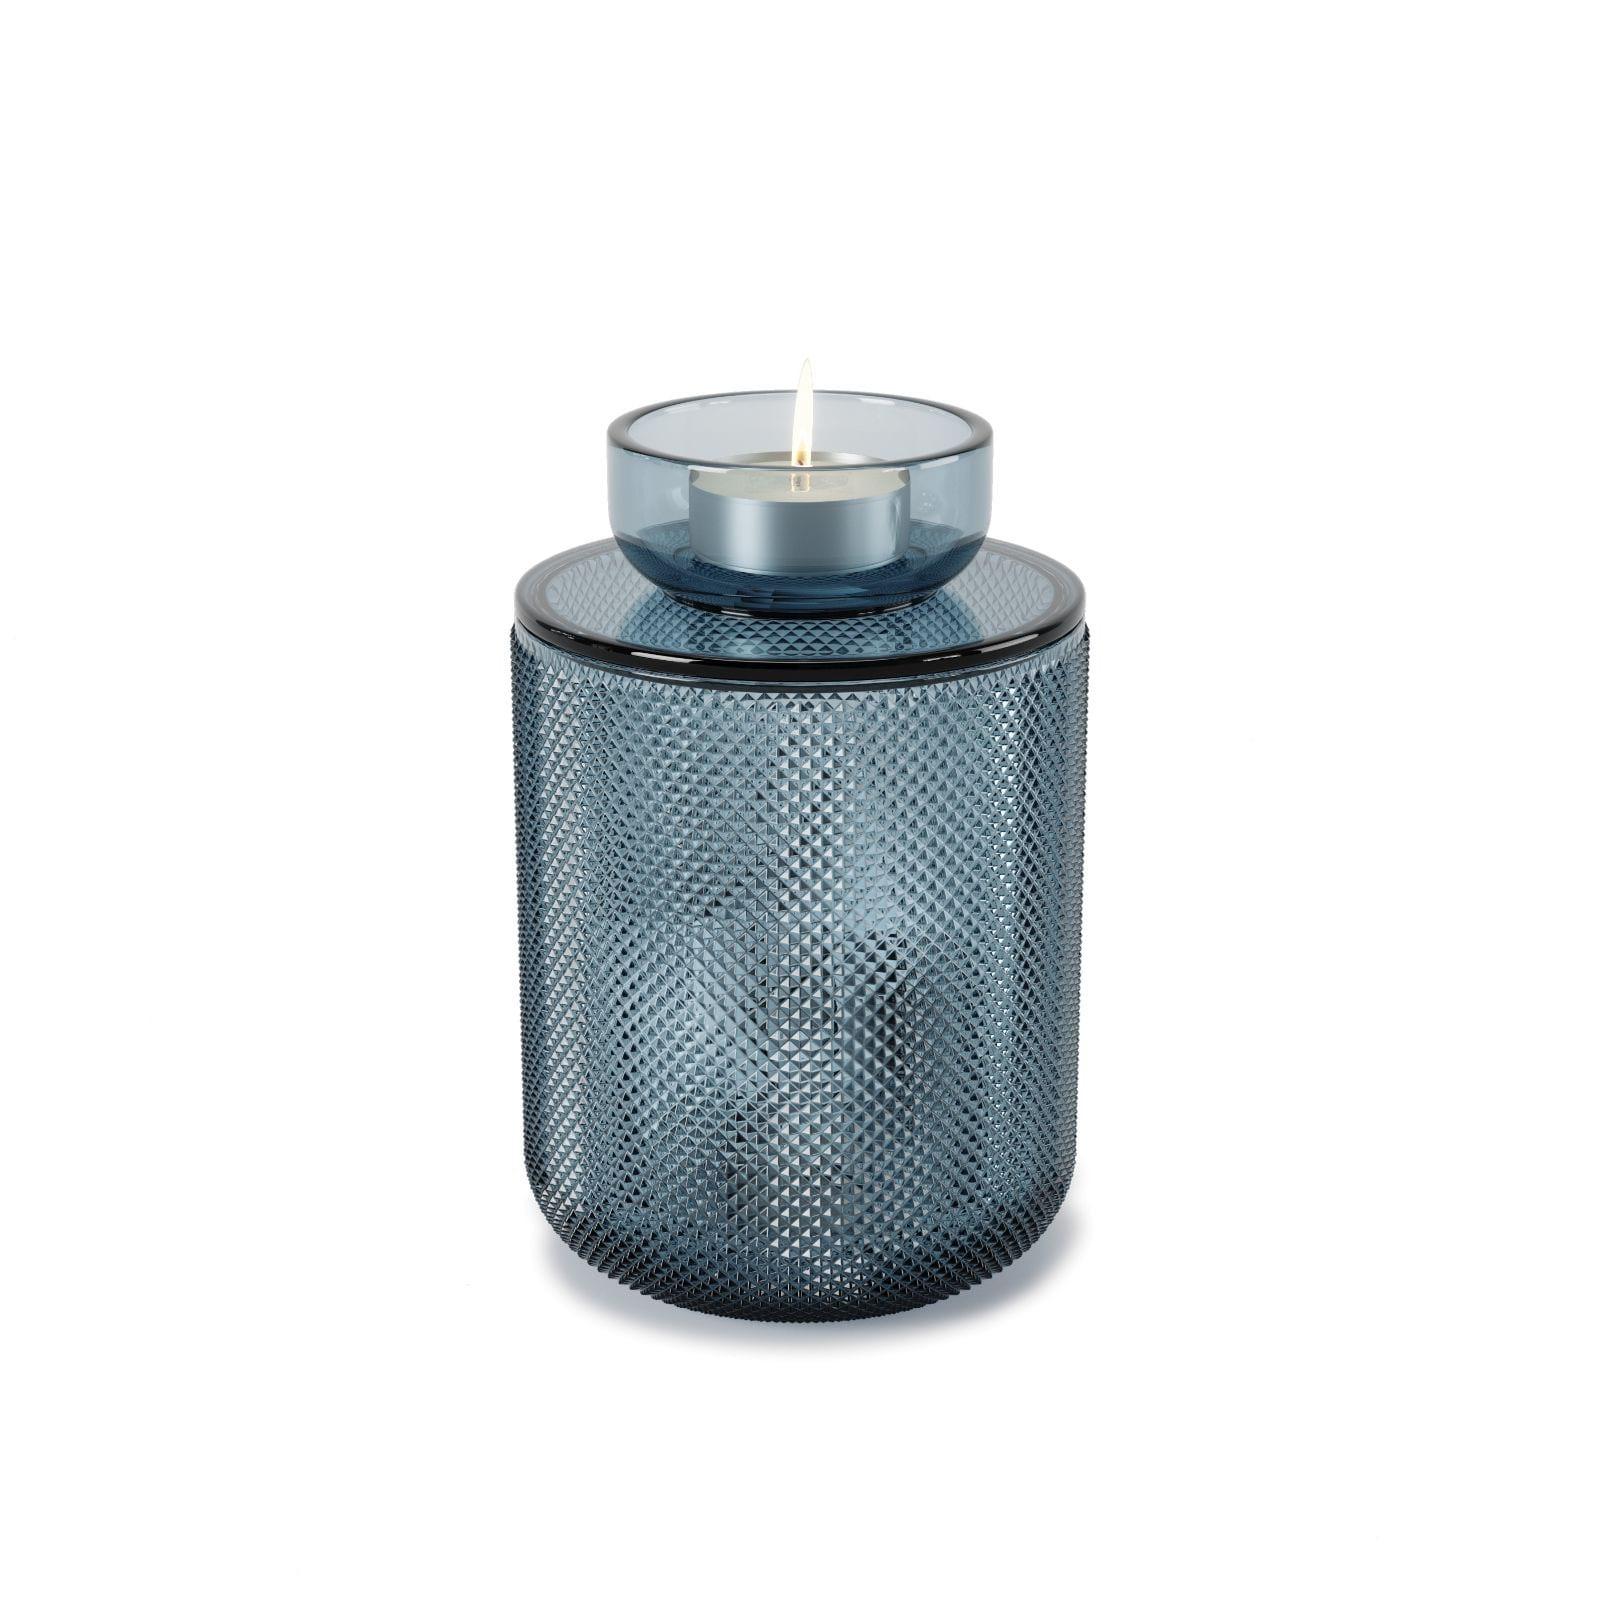 Allira Organizer Large Blue (Glass) – Umbra